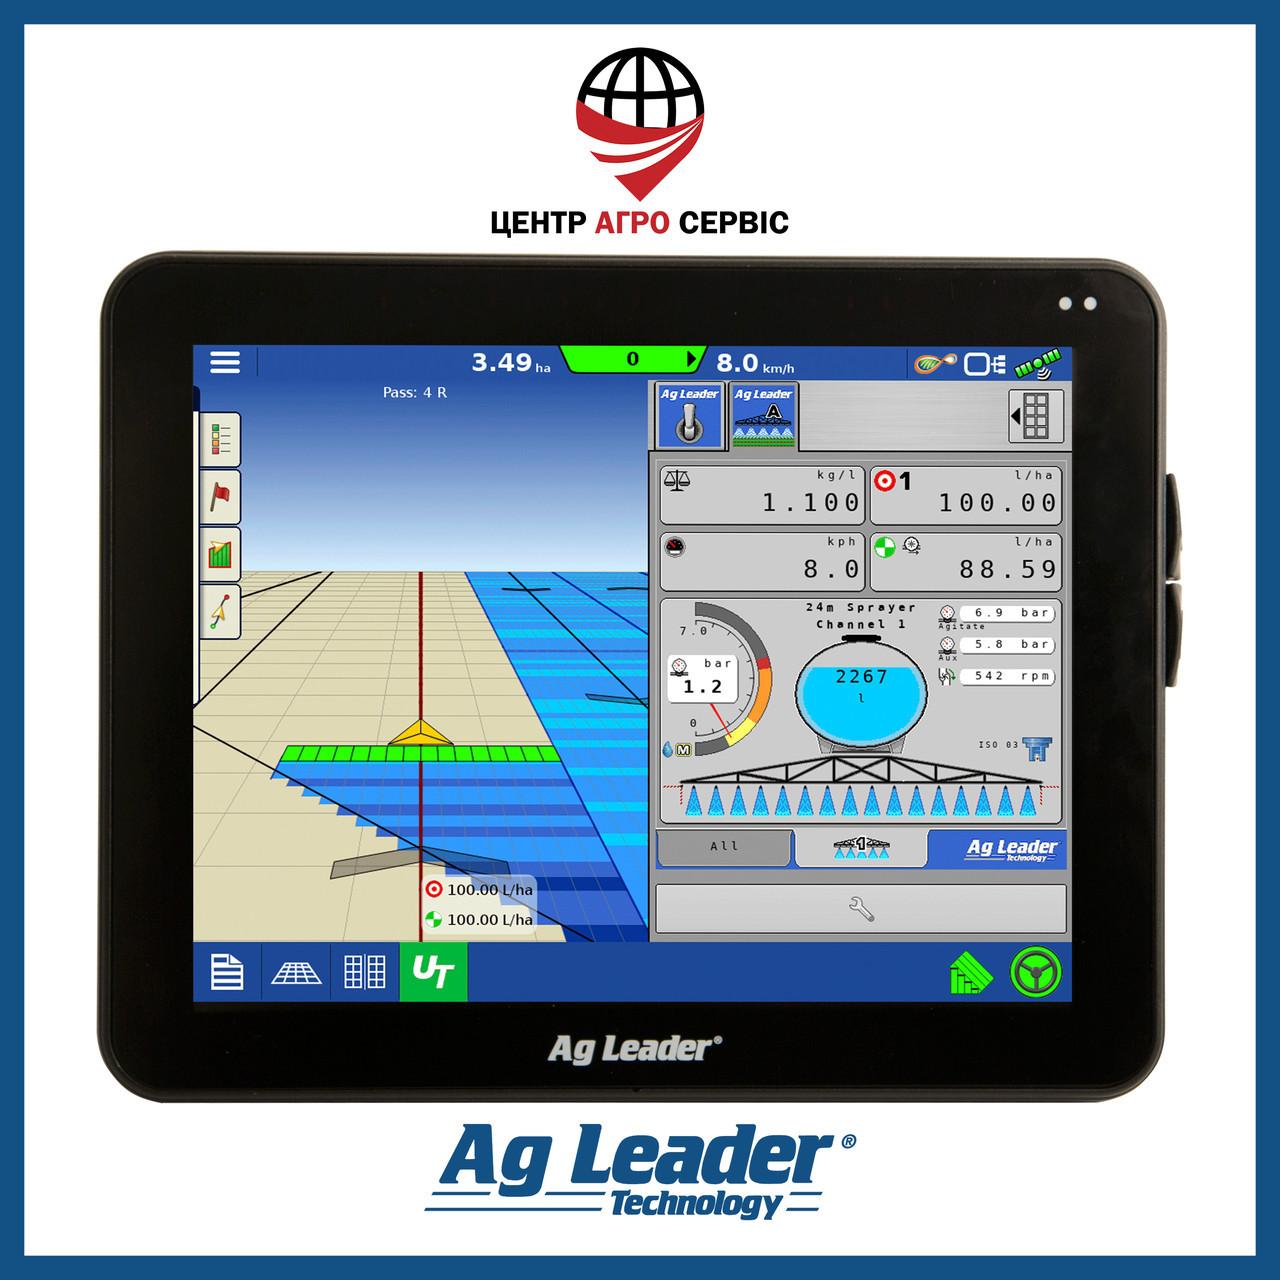 Gps навигатор для трактора (навигатор для поля, сельхоз навигатор)  Аг Лидер 1200